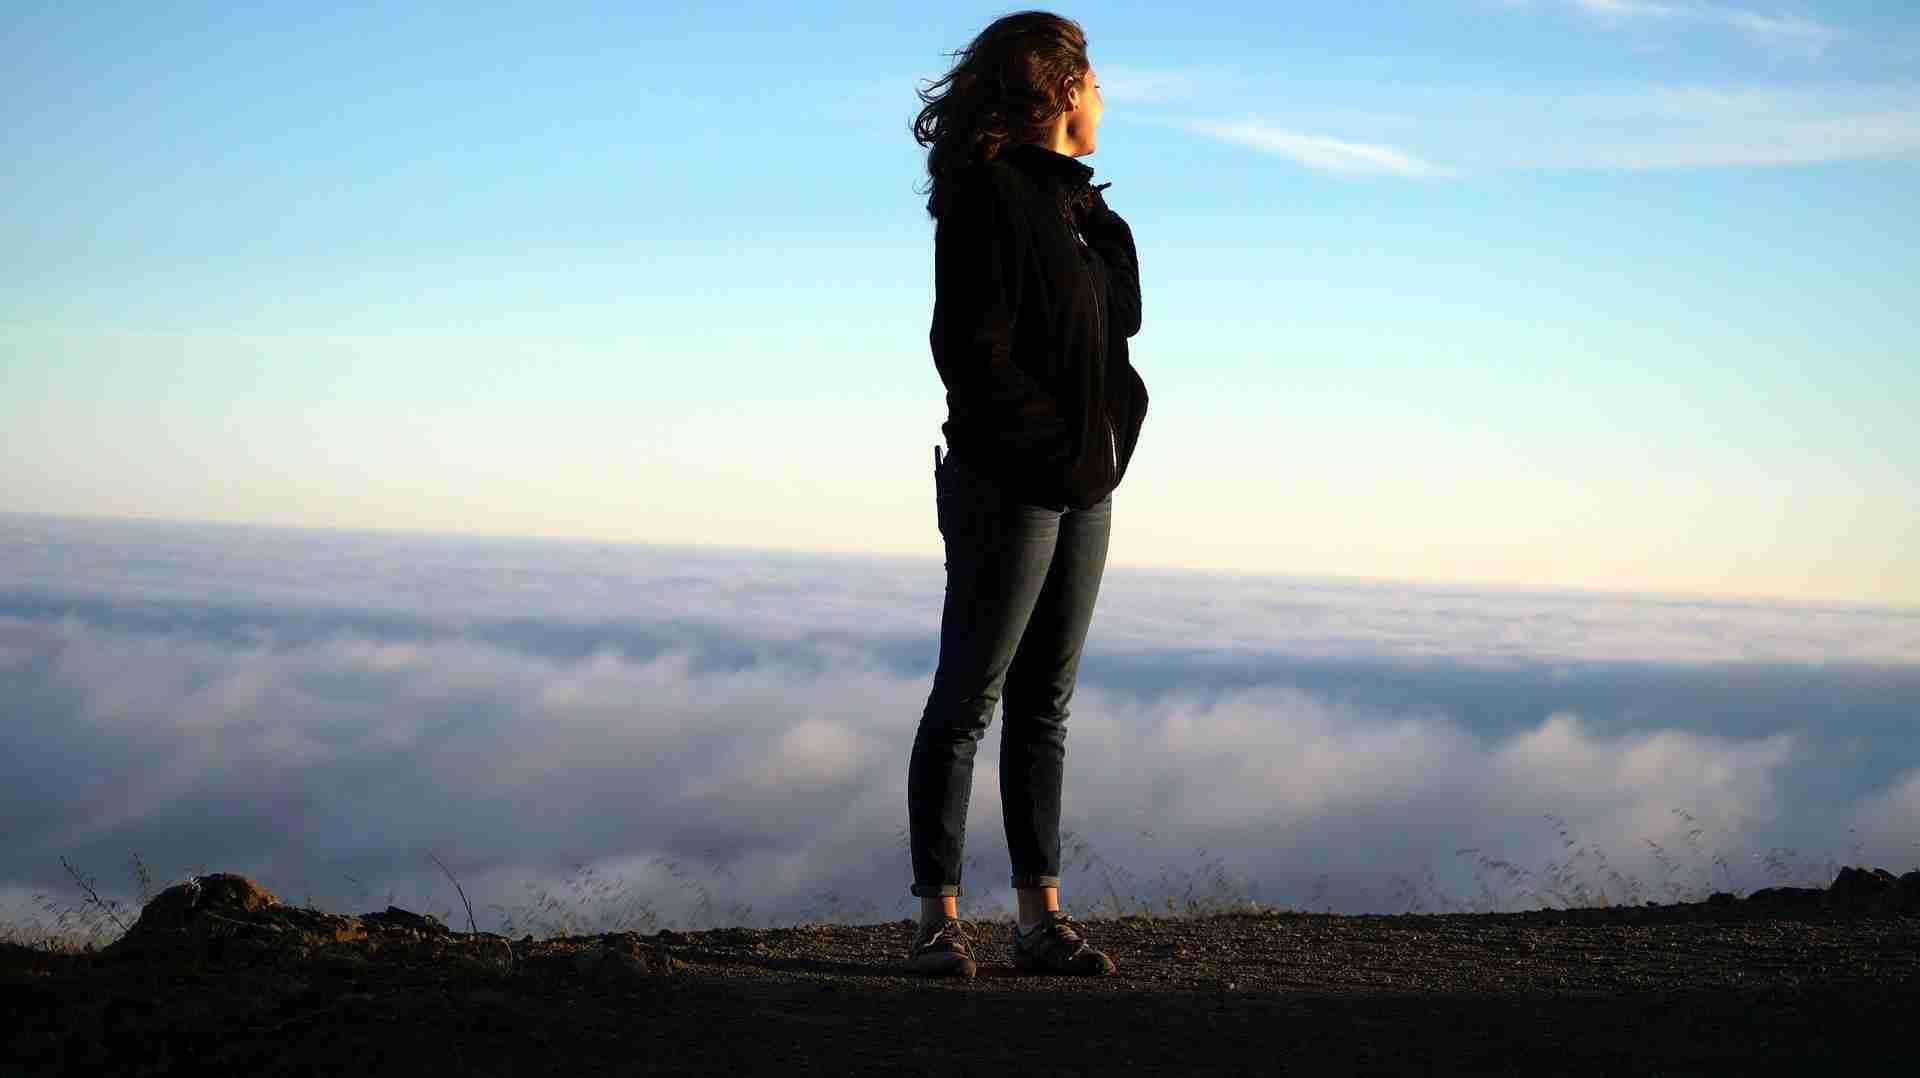 Facing loneliness (c) KarinSieger.com